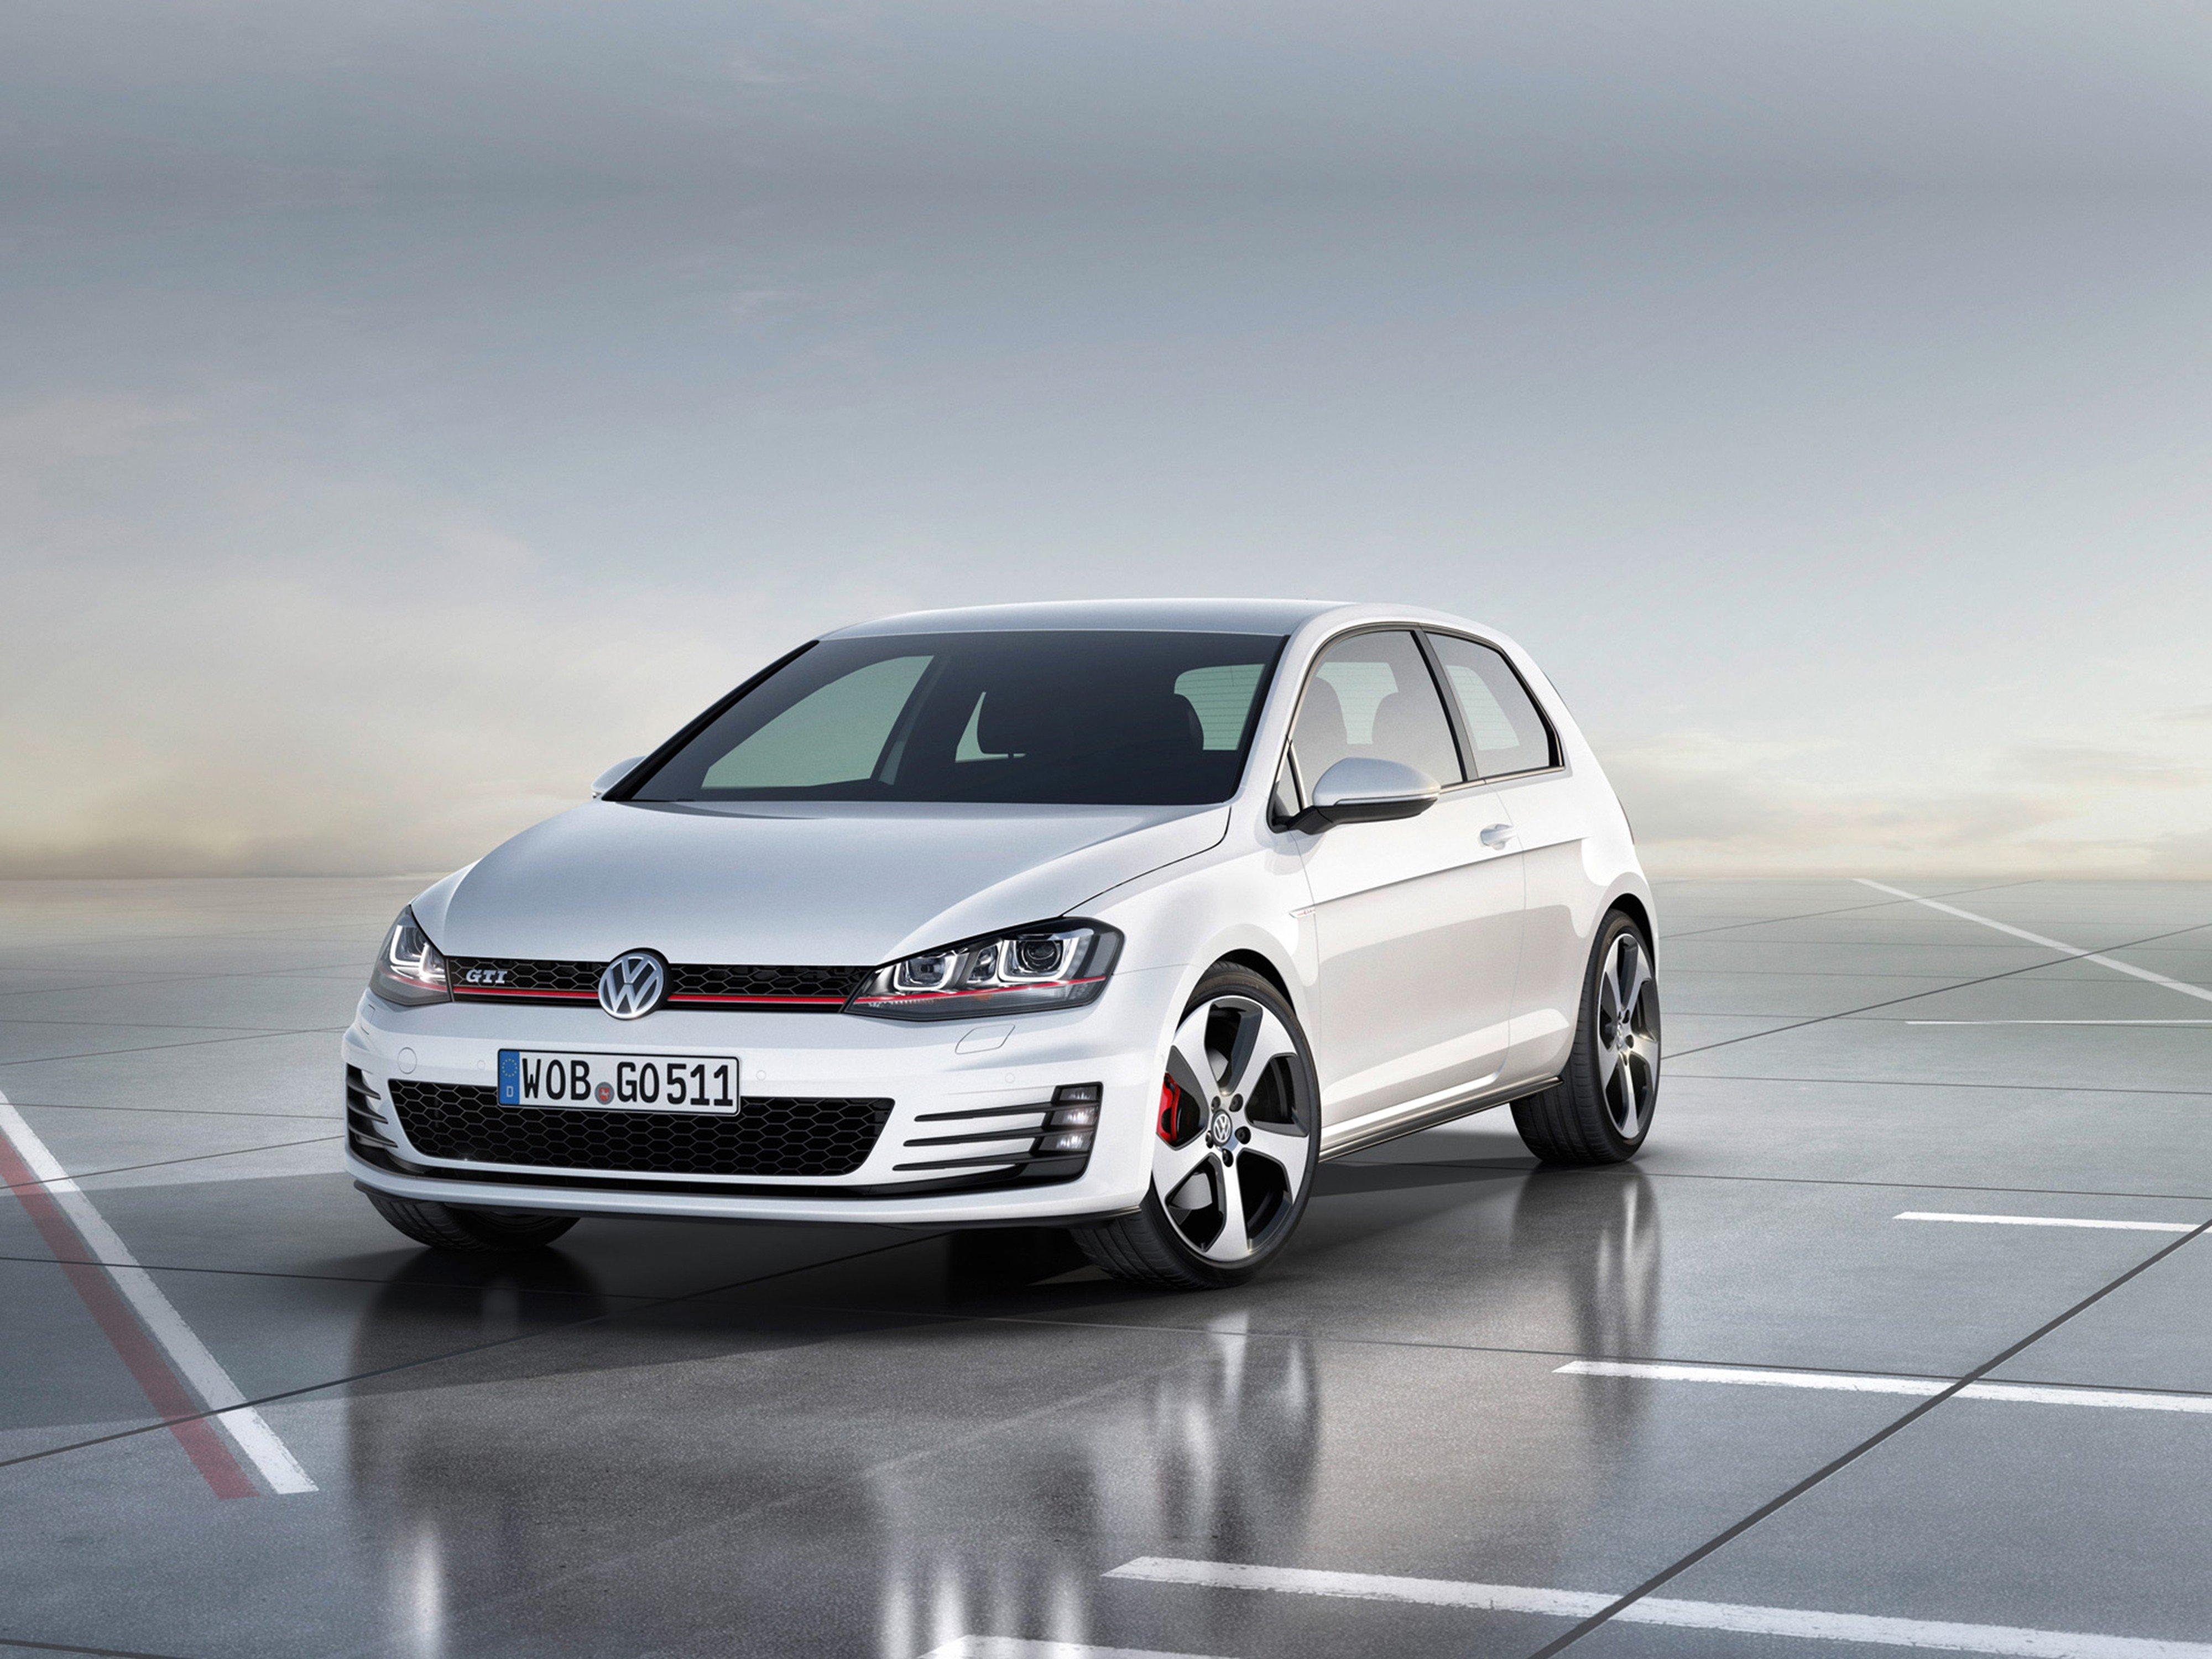 volkswagen golf gti concept car vehicle germany   wallpaper